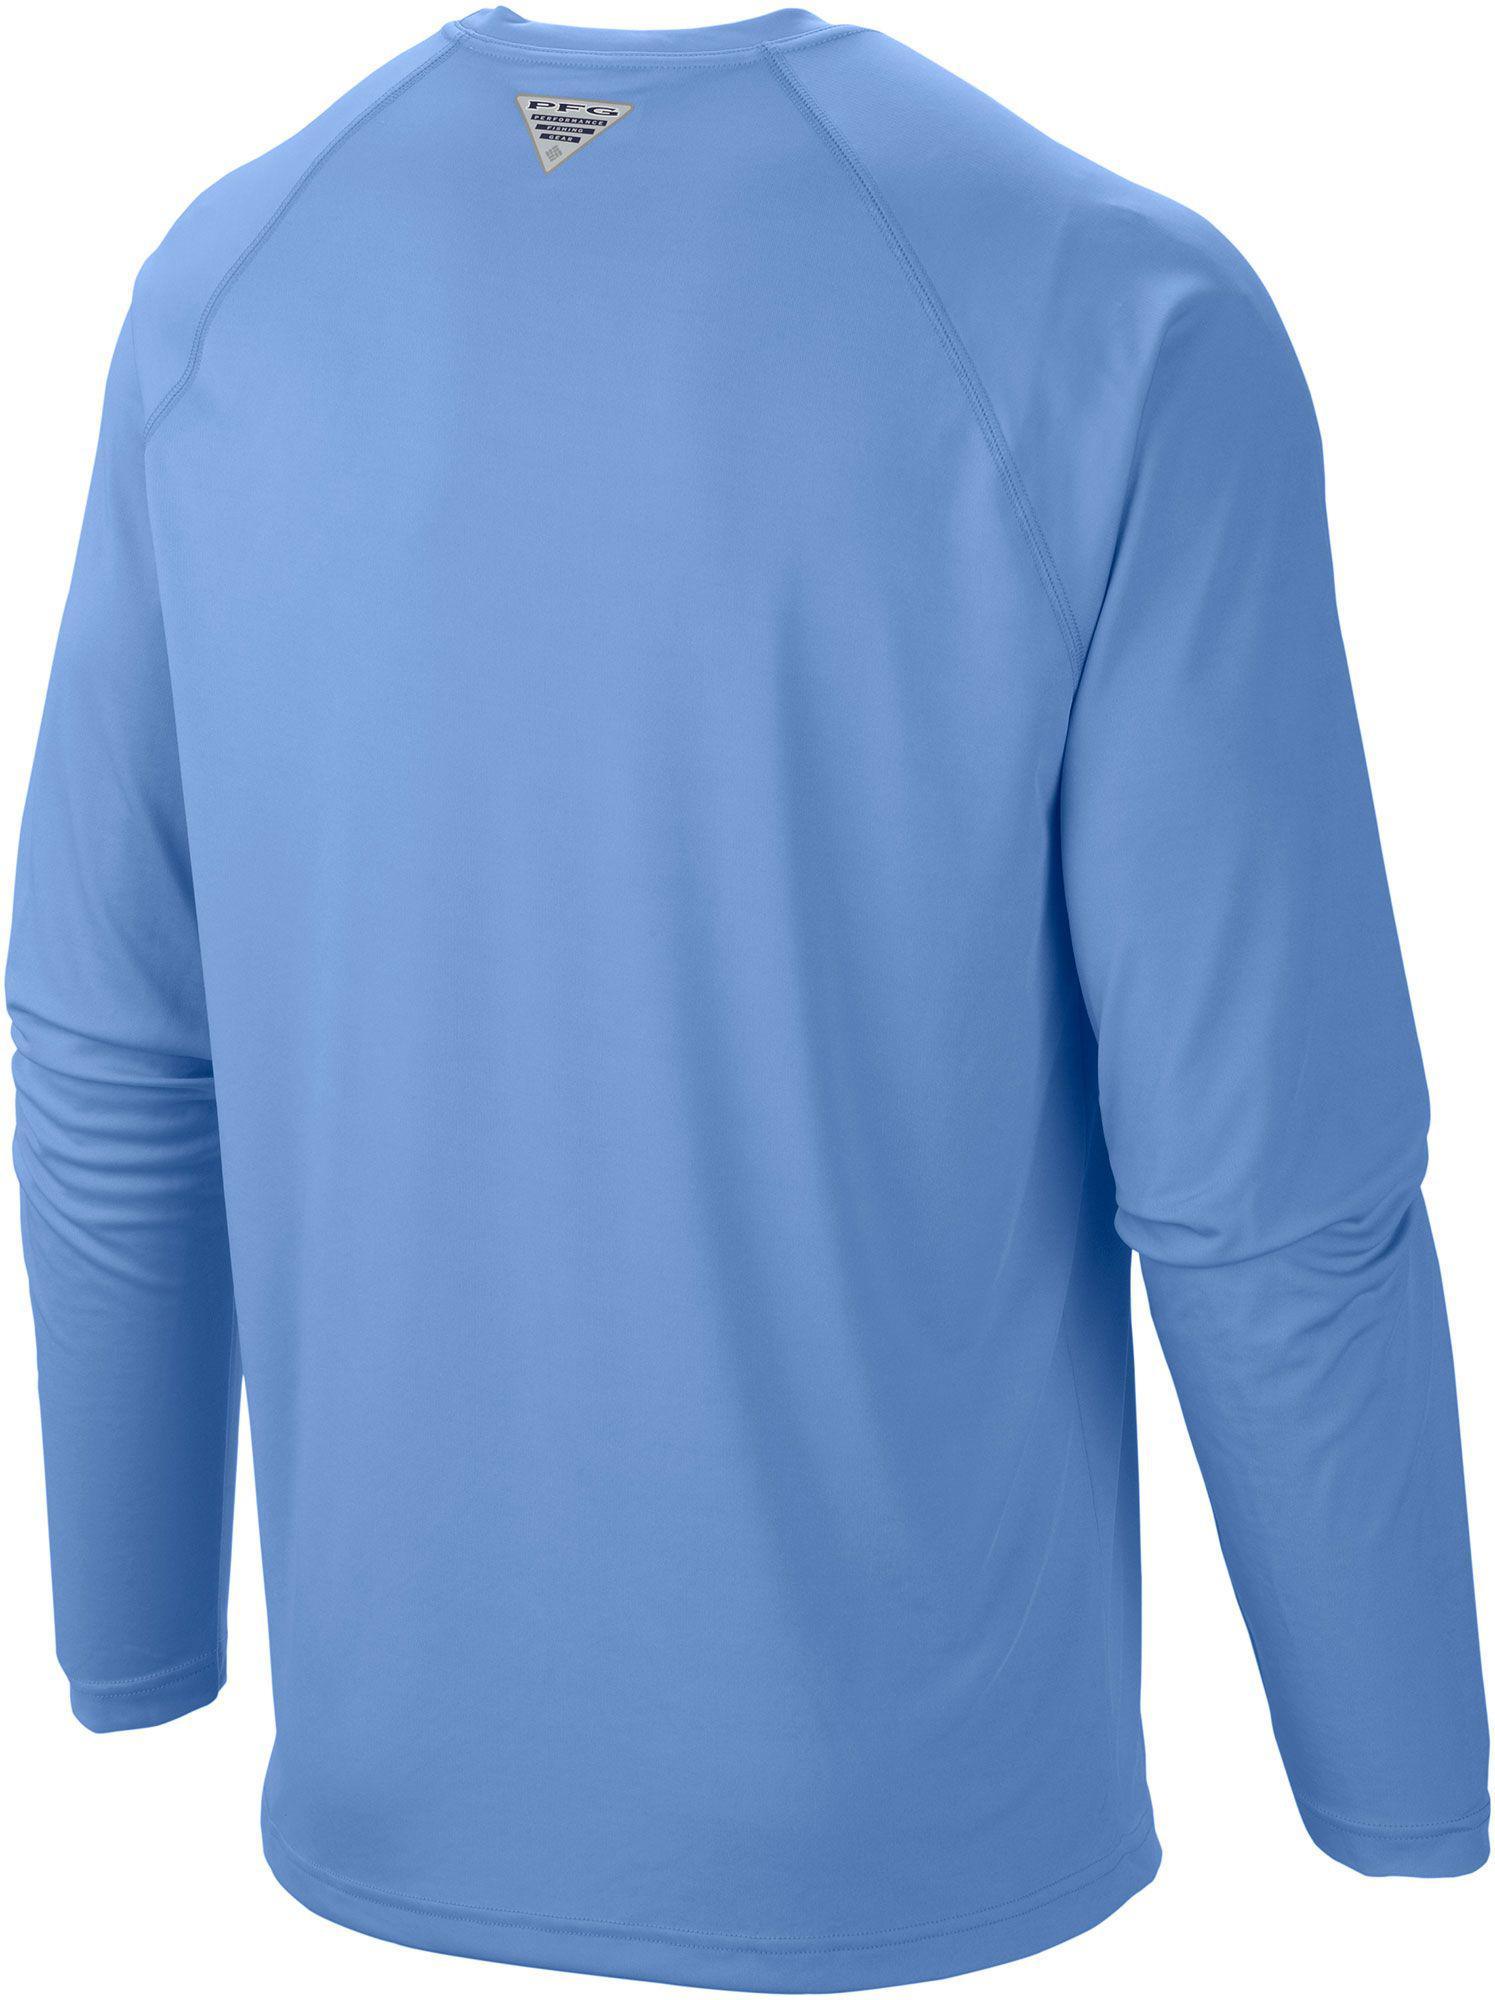 05f251dc298d ... Pfg Terminal Tackle Long Sleeve Shirt - Tall for Men - Lyst. View  fullscreen